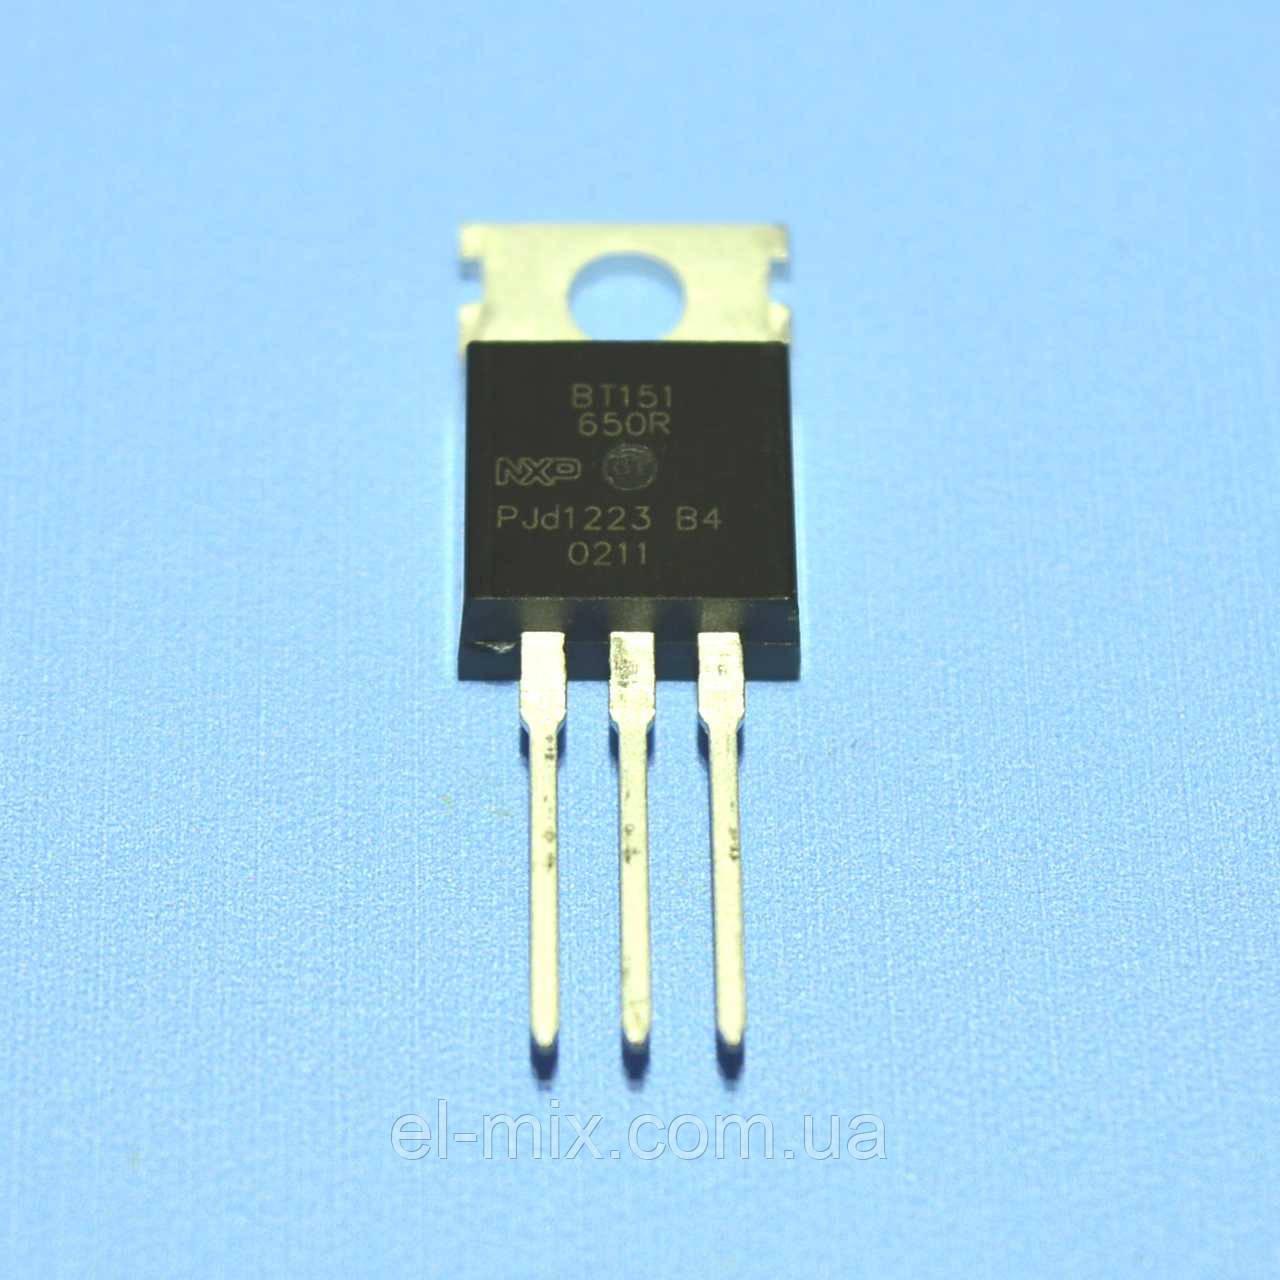 Тиристор BT151-650R  TO-220  NXP